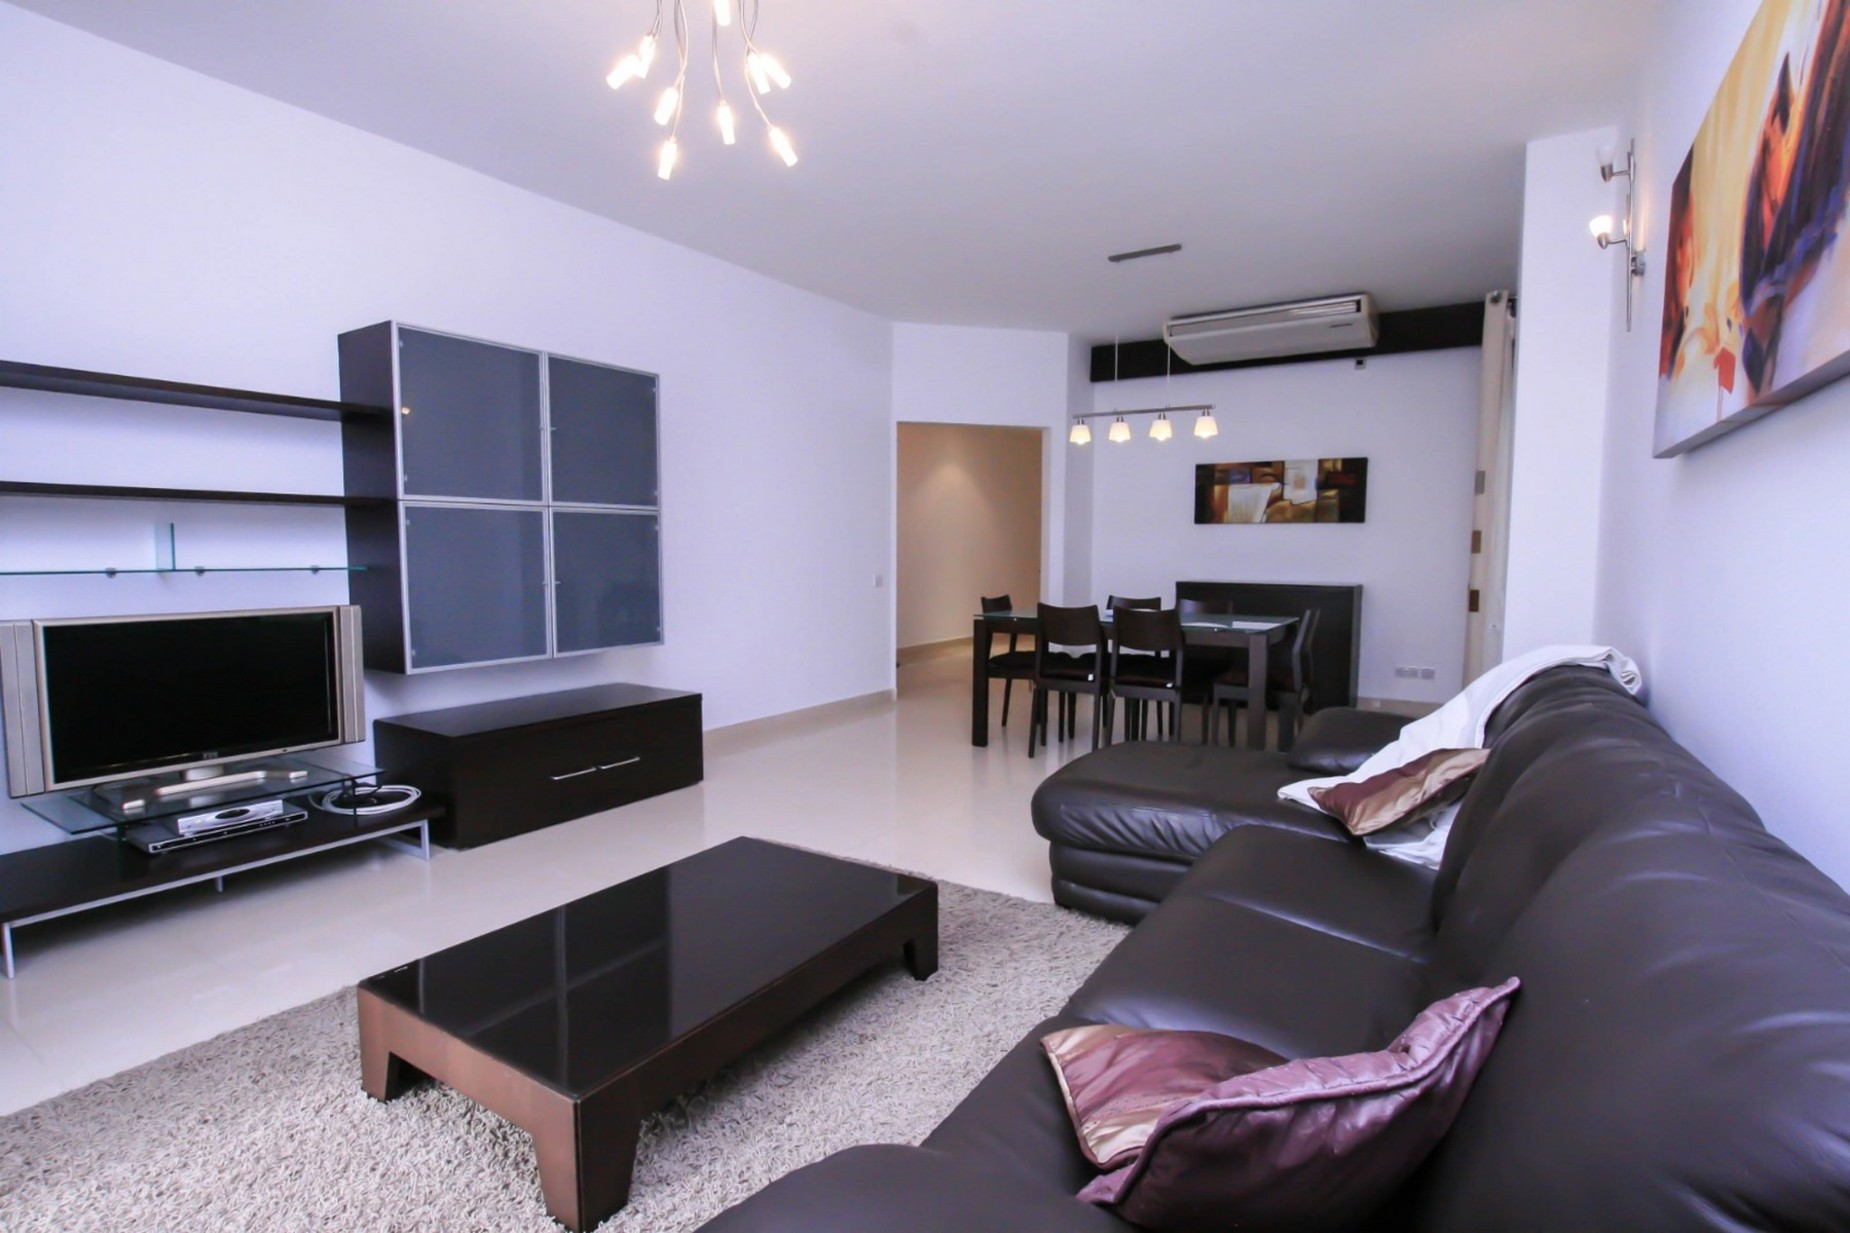 3 bed Maisonette For Rent in Swieqi, Swieqi - thumb 2